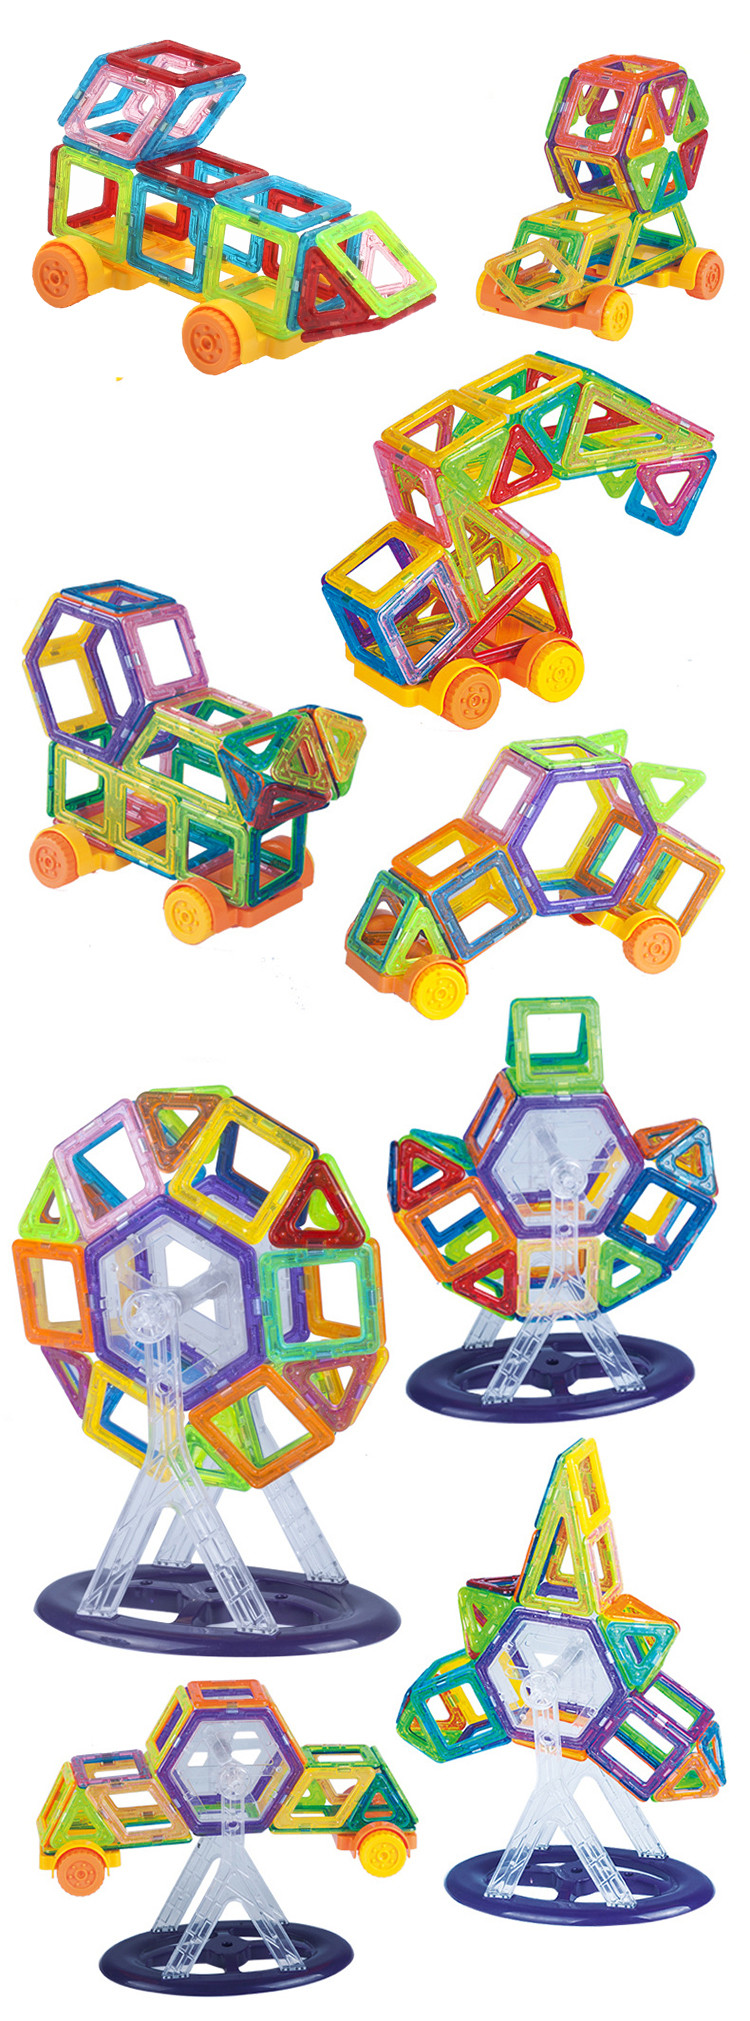 Rial Toys Creative 46PCS 6